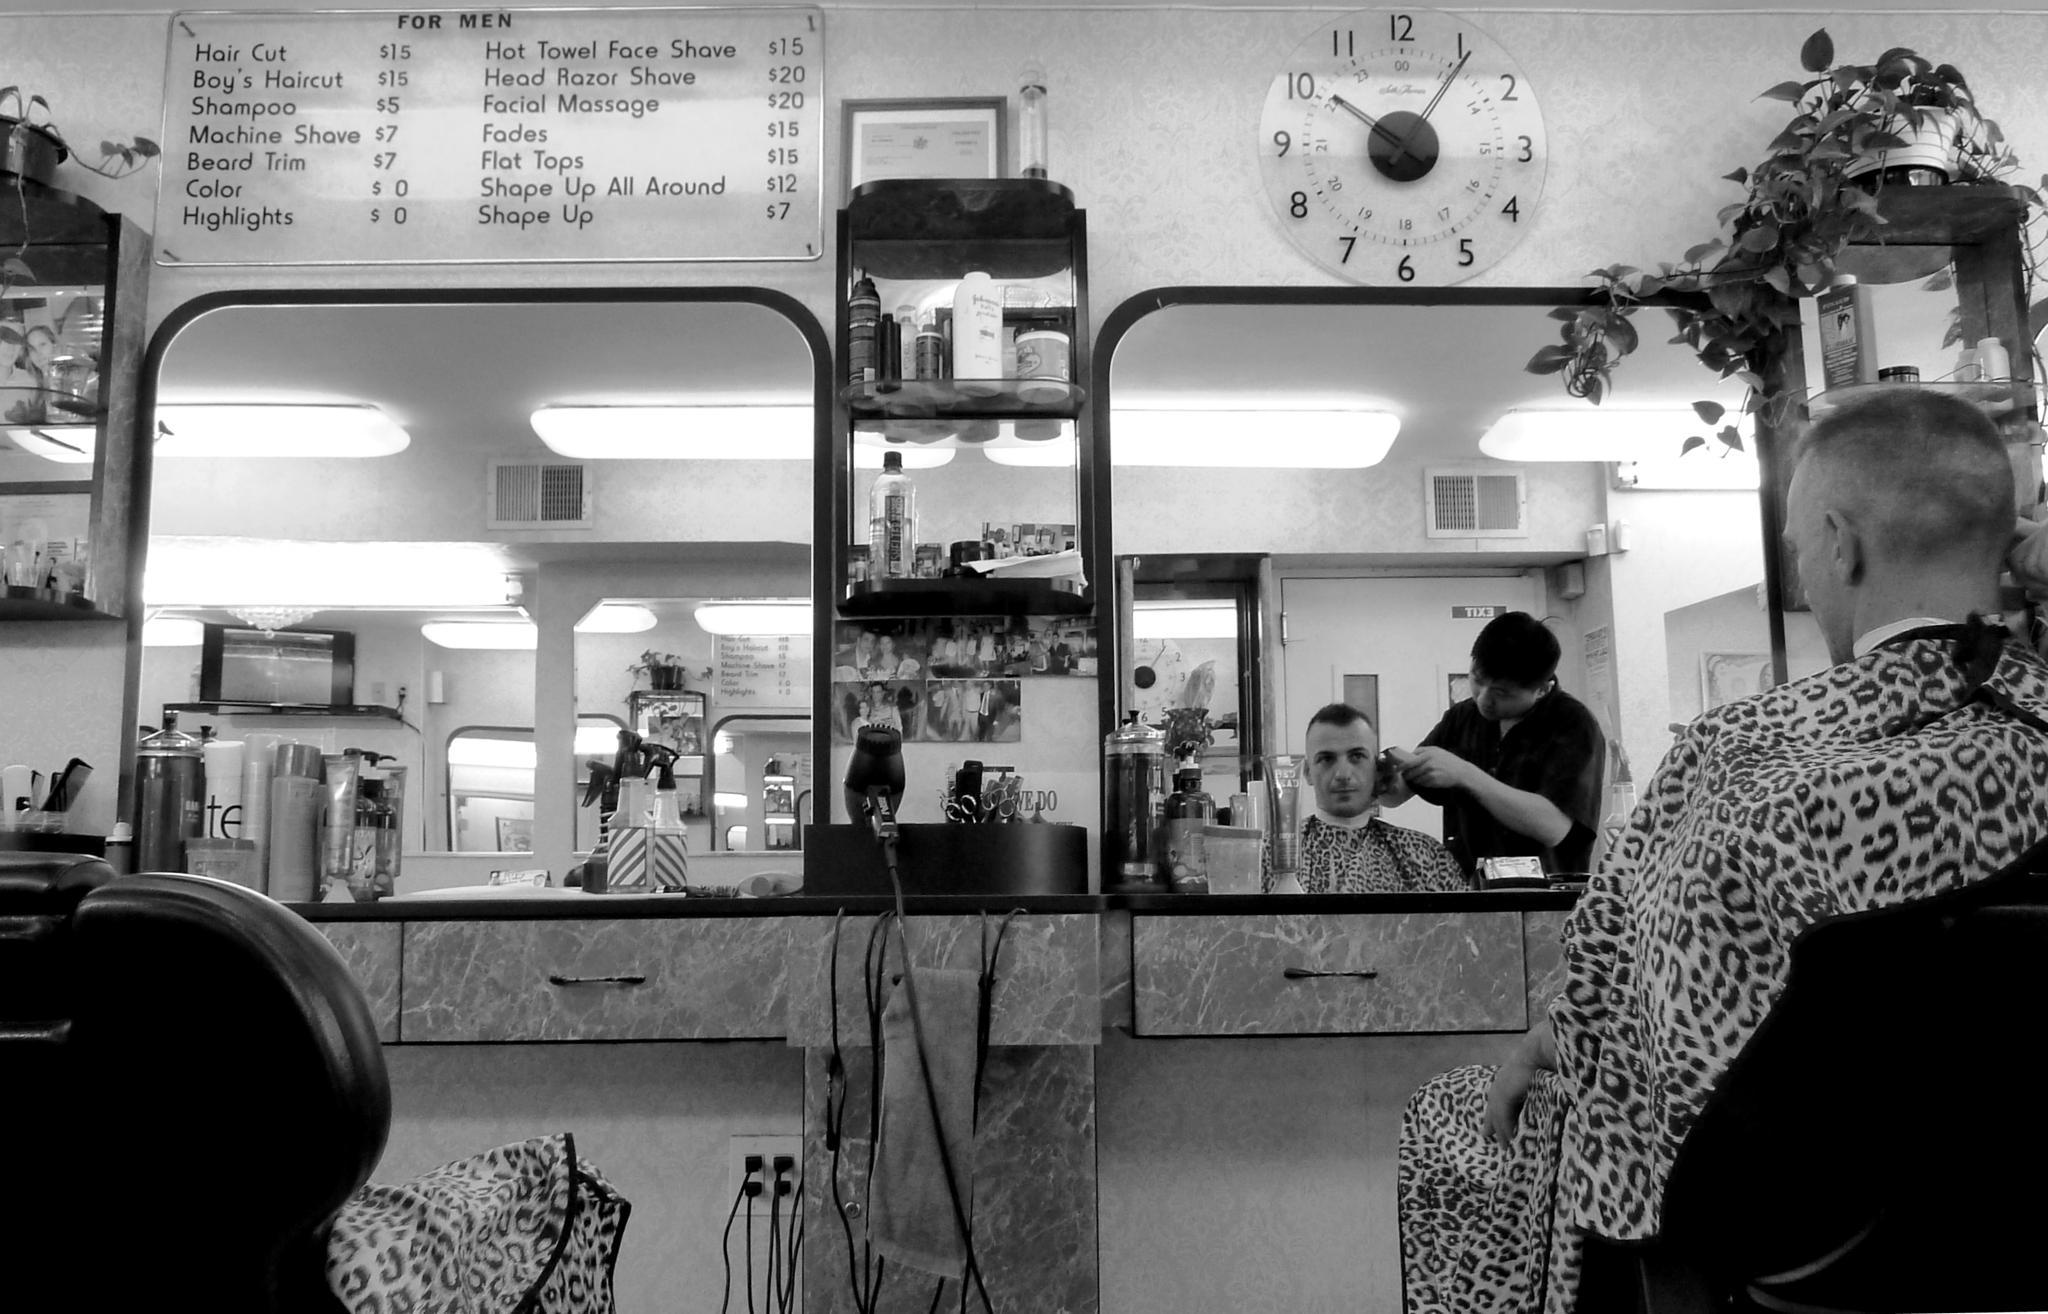 Barber shop, NYC. by Anton Agalbato